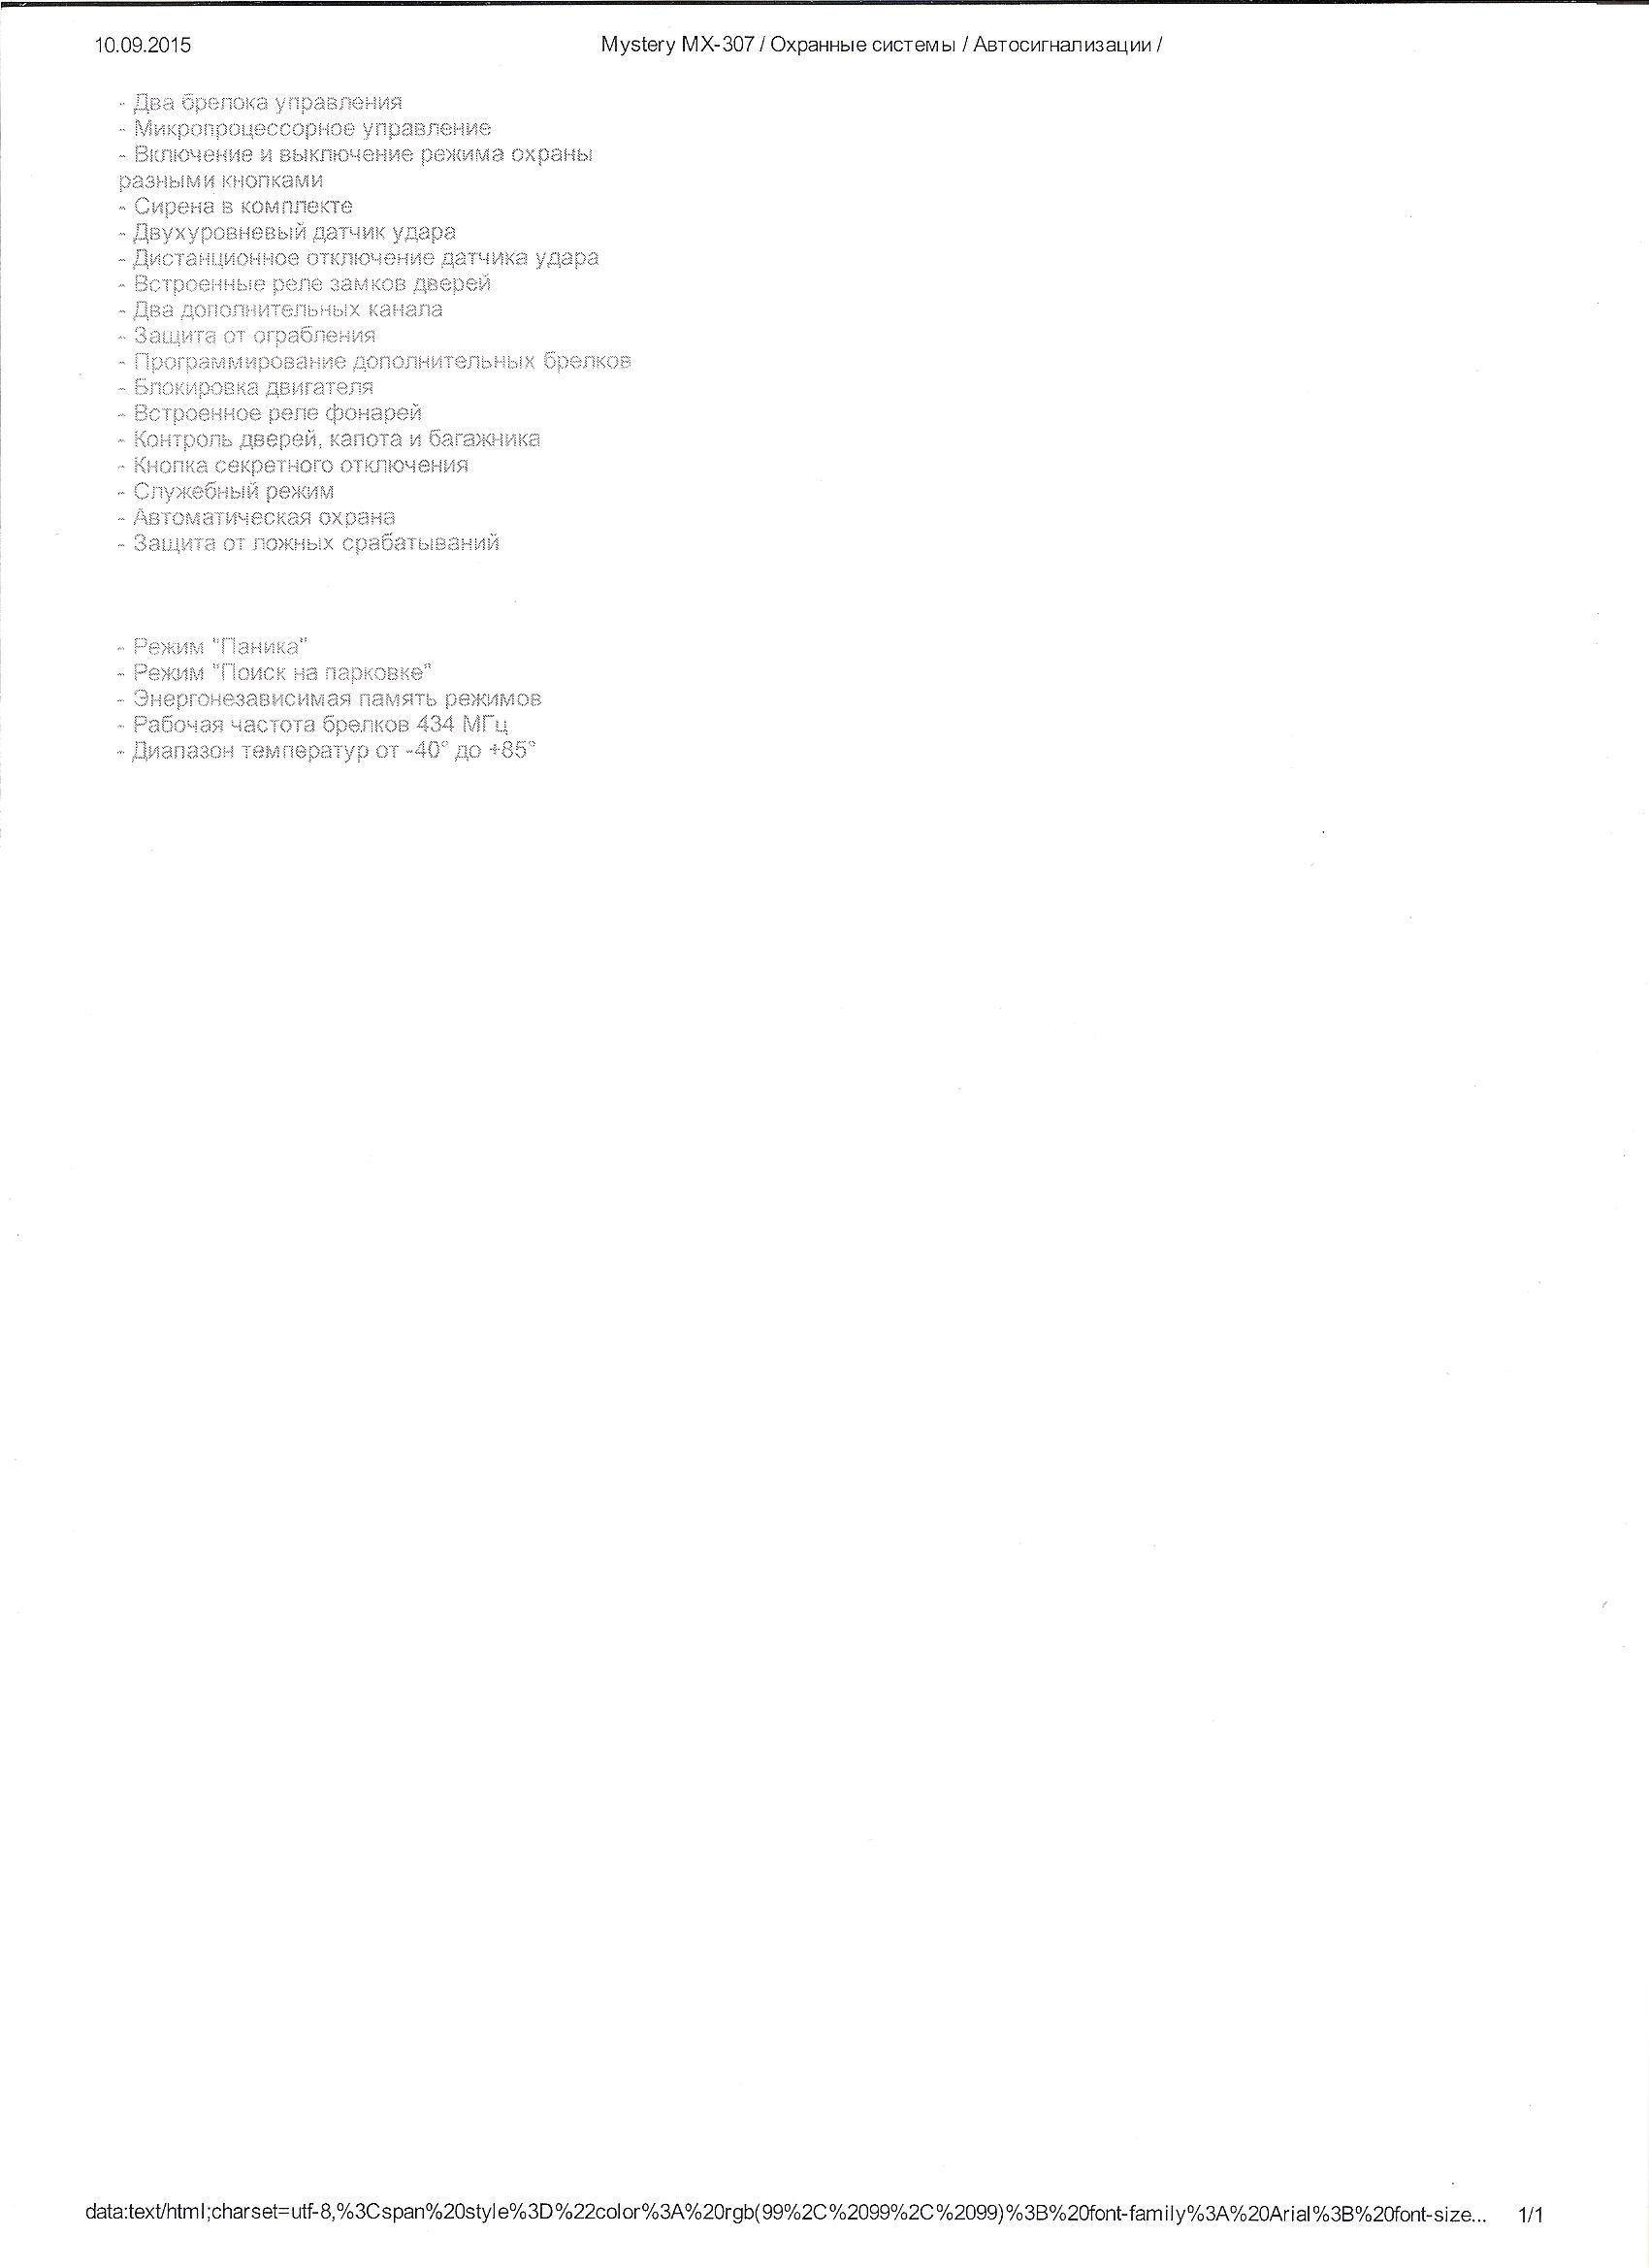 сигнализация mongoose add on схема подключения